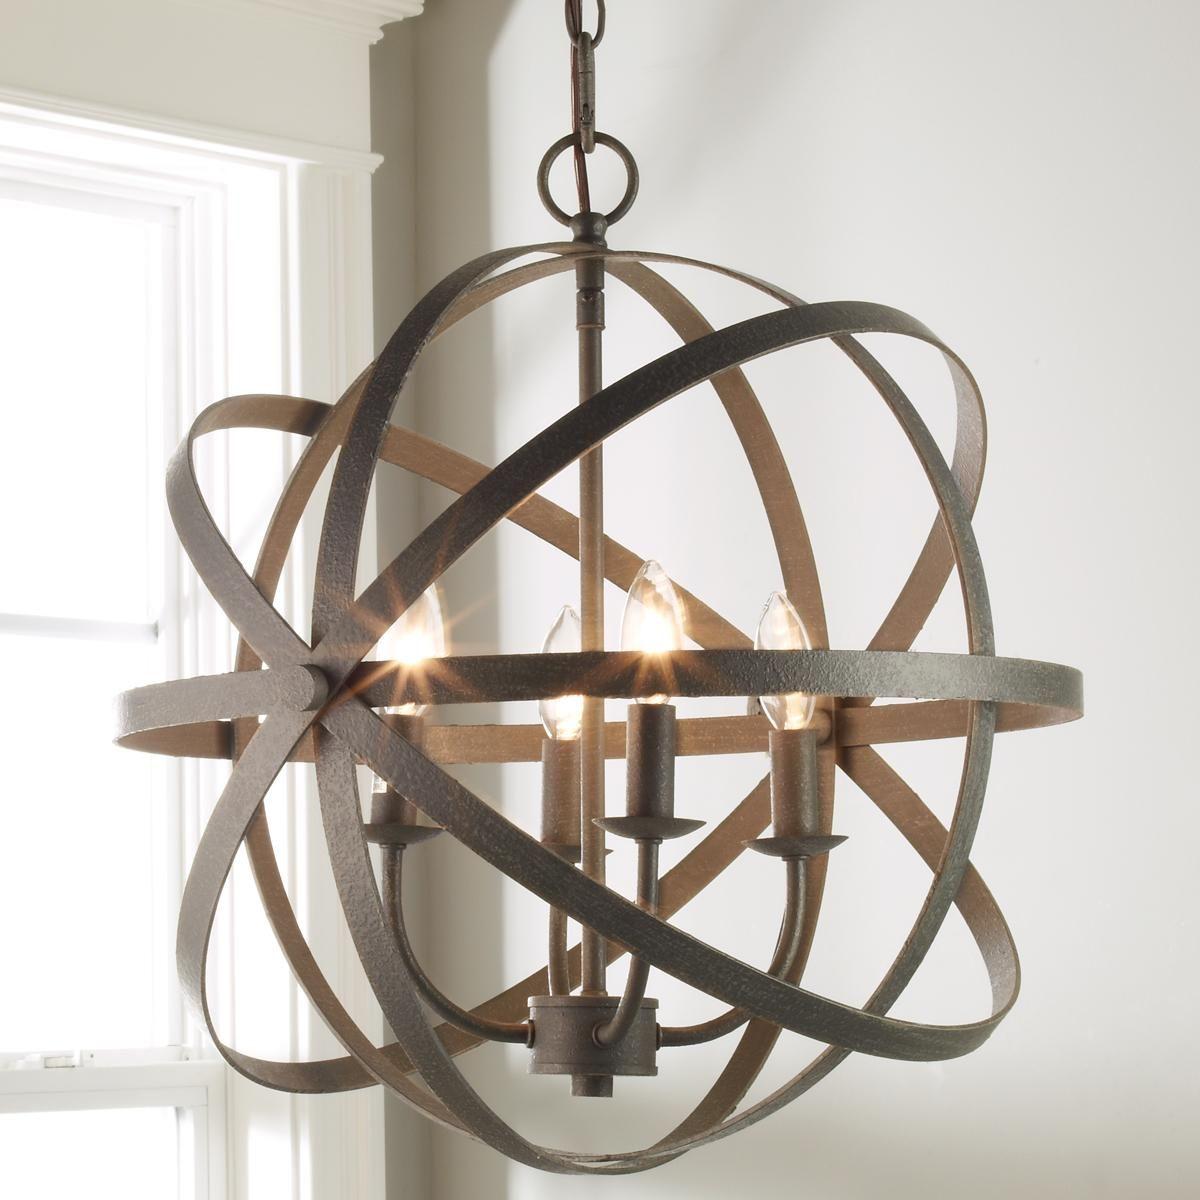 Orbit Globe Chandelier 4 Light Modern Lighting Chandeliers